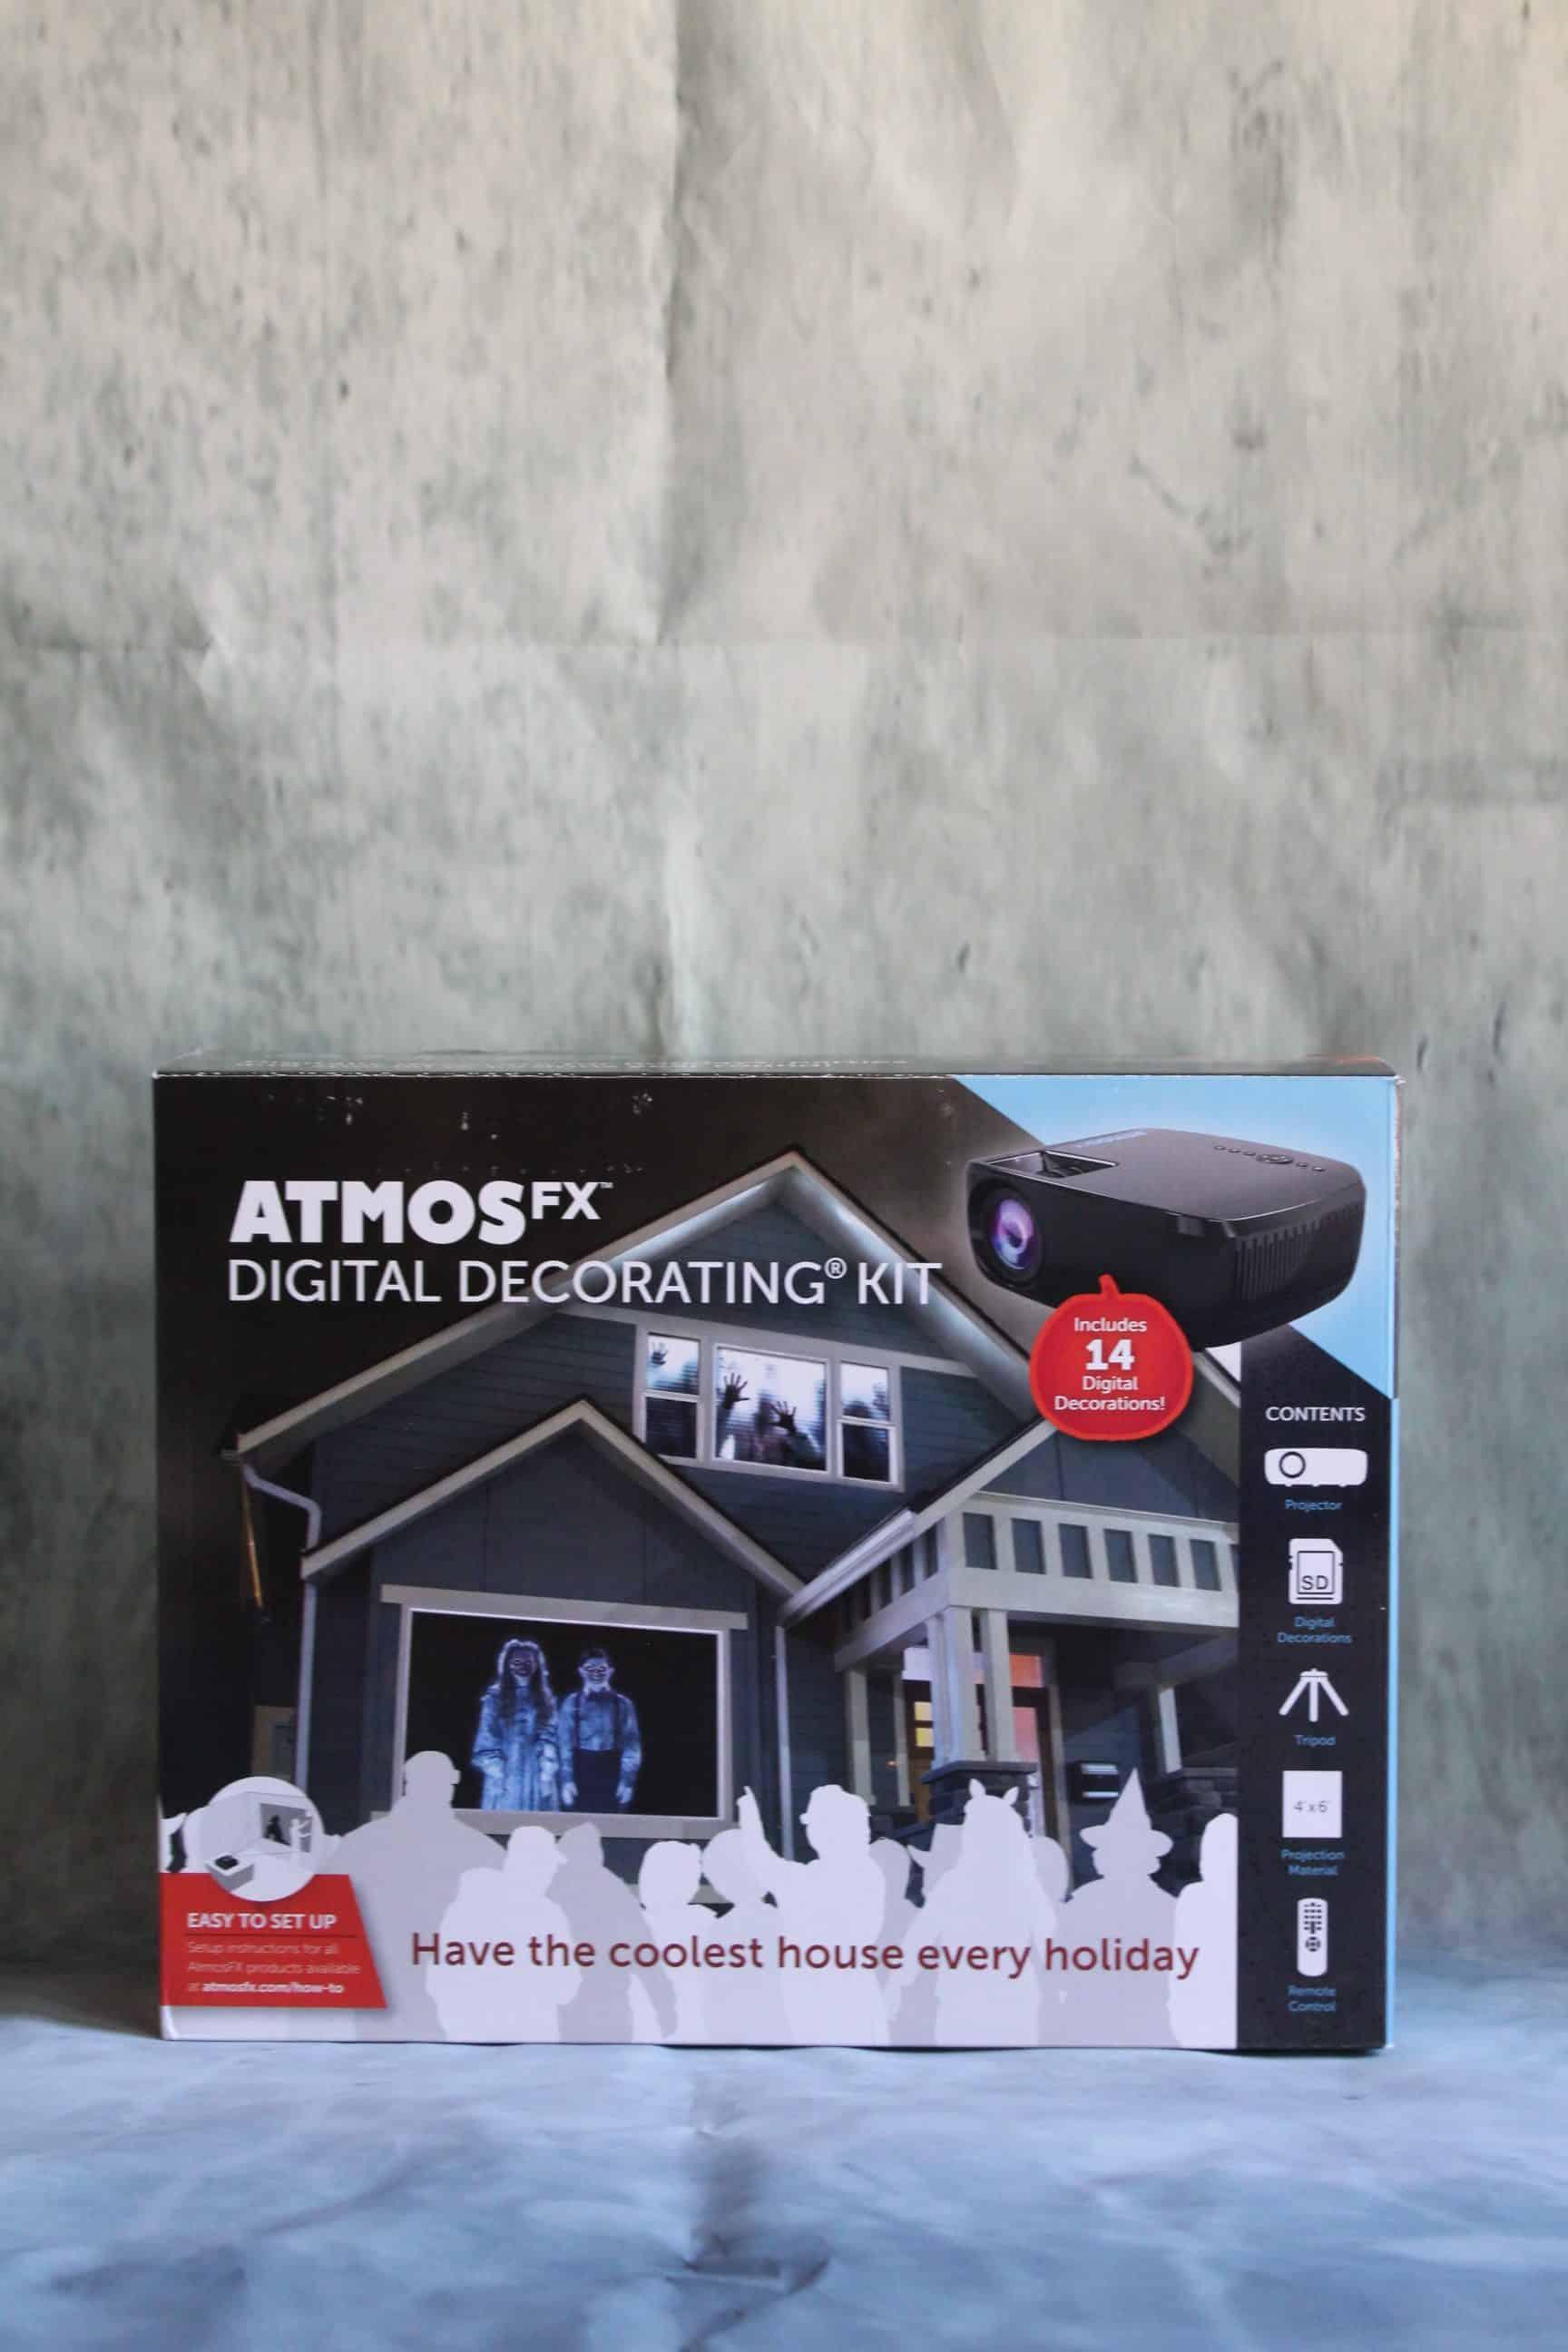 Atmos FX Digital Decorating Kit